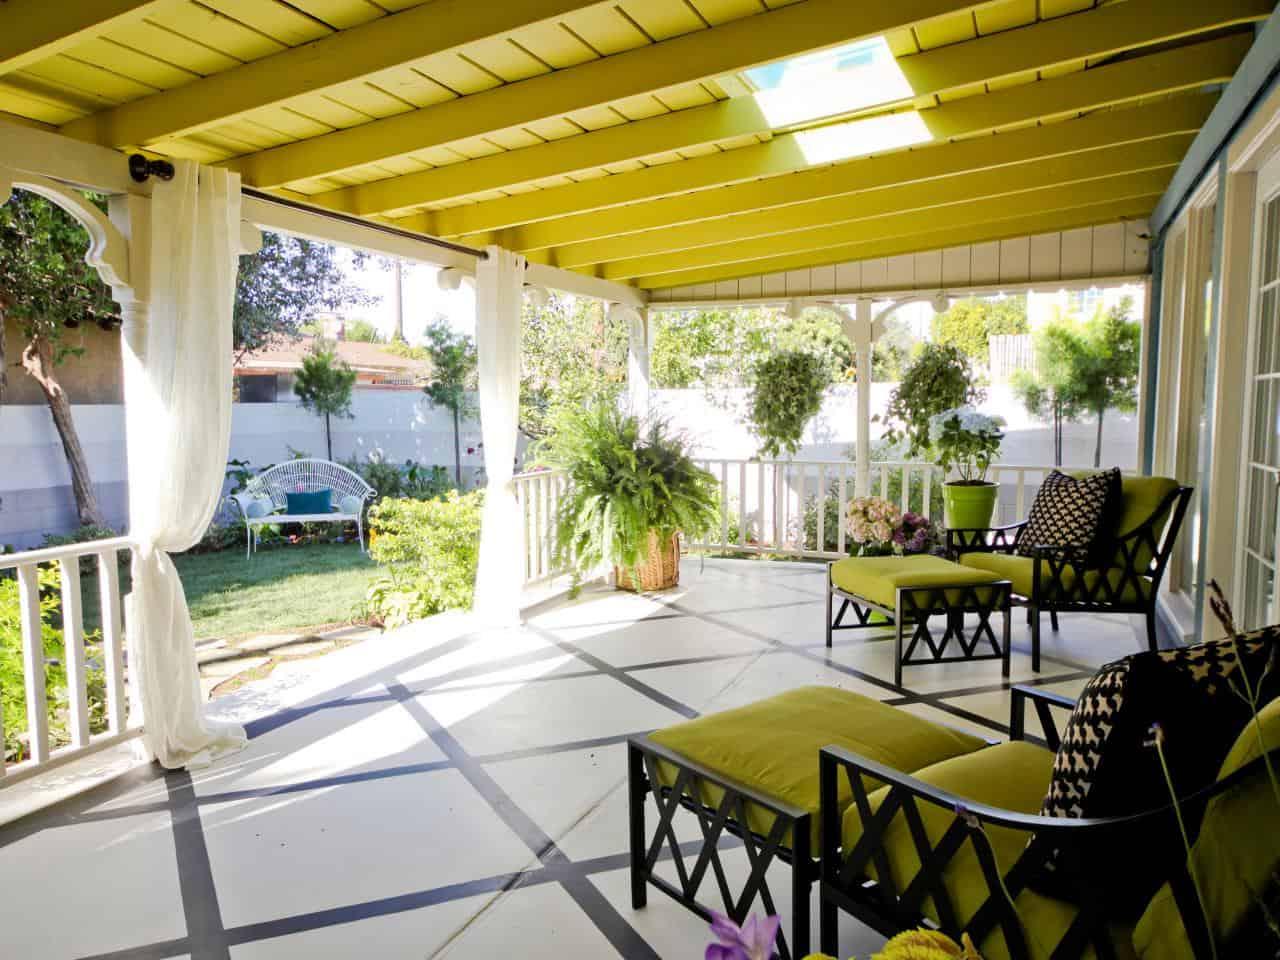 Gazebo Ideas Your Home Needs